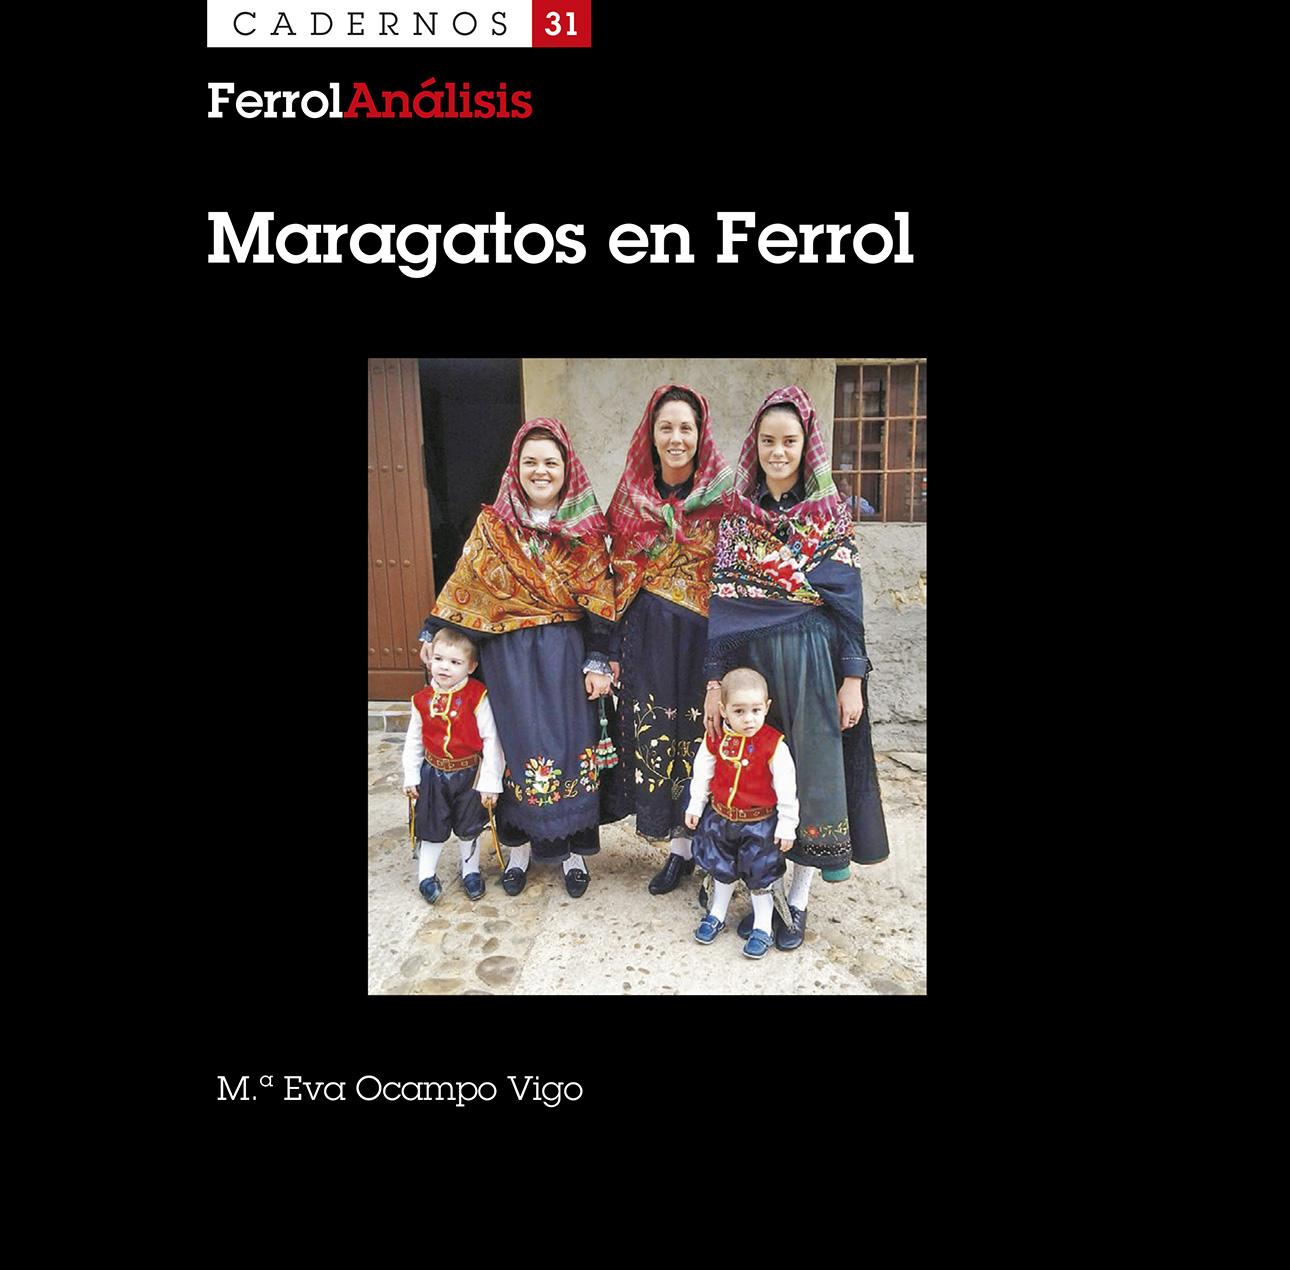 Caderno 31 FerrolAnálisis